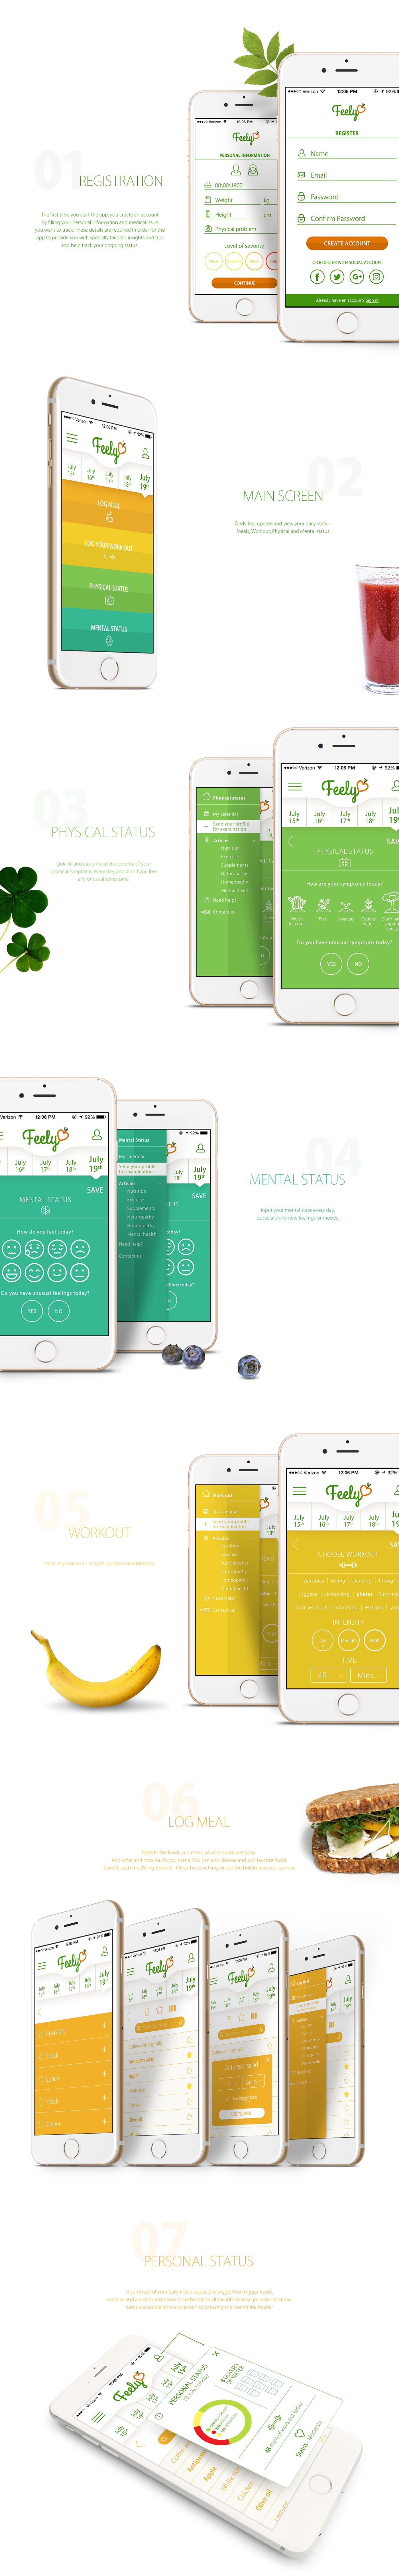 Health app Diary UI ux Food  uxdesign uidesign UI\UX wireframe